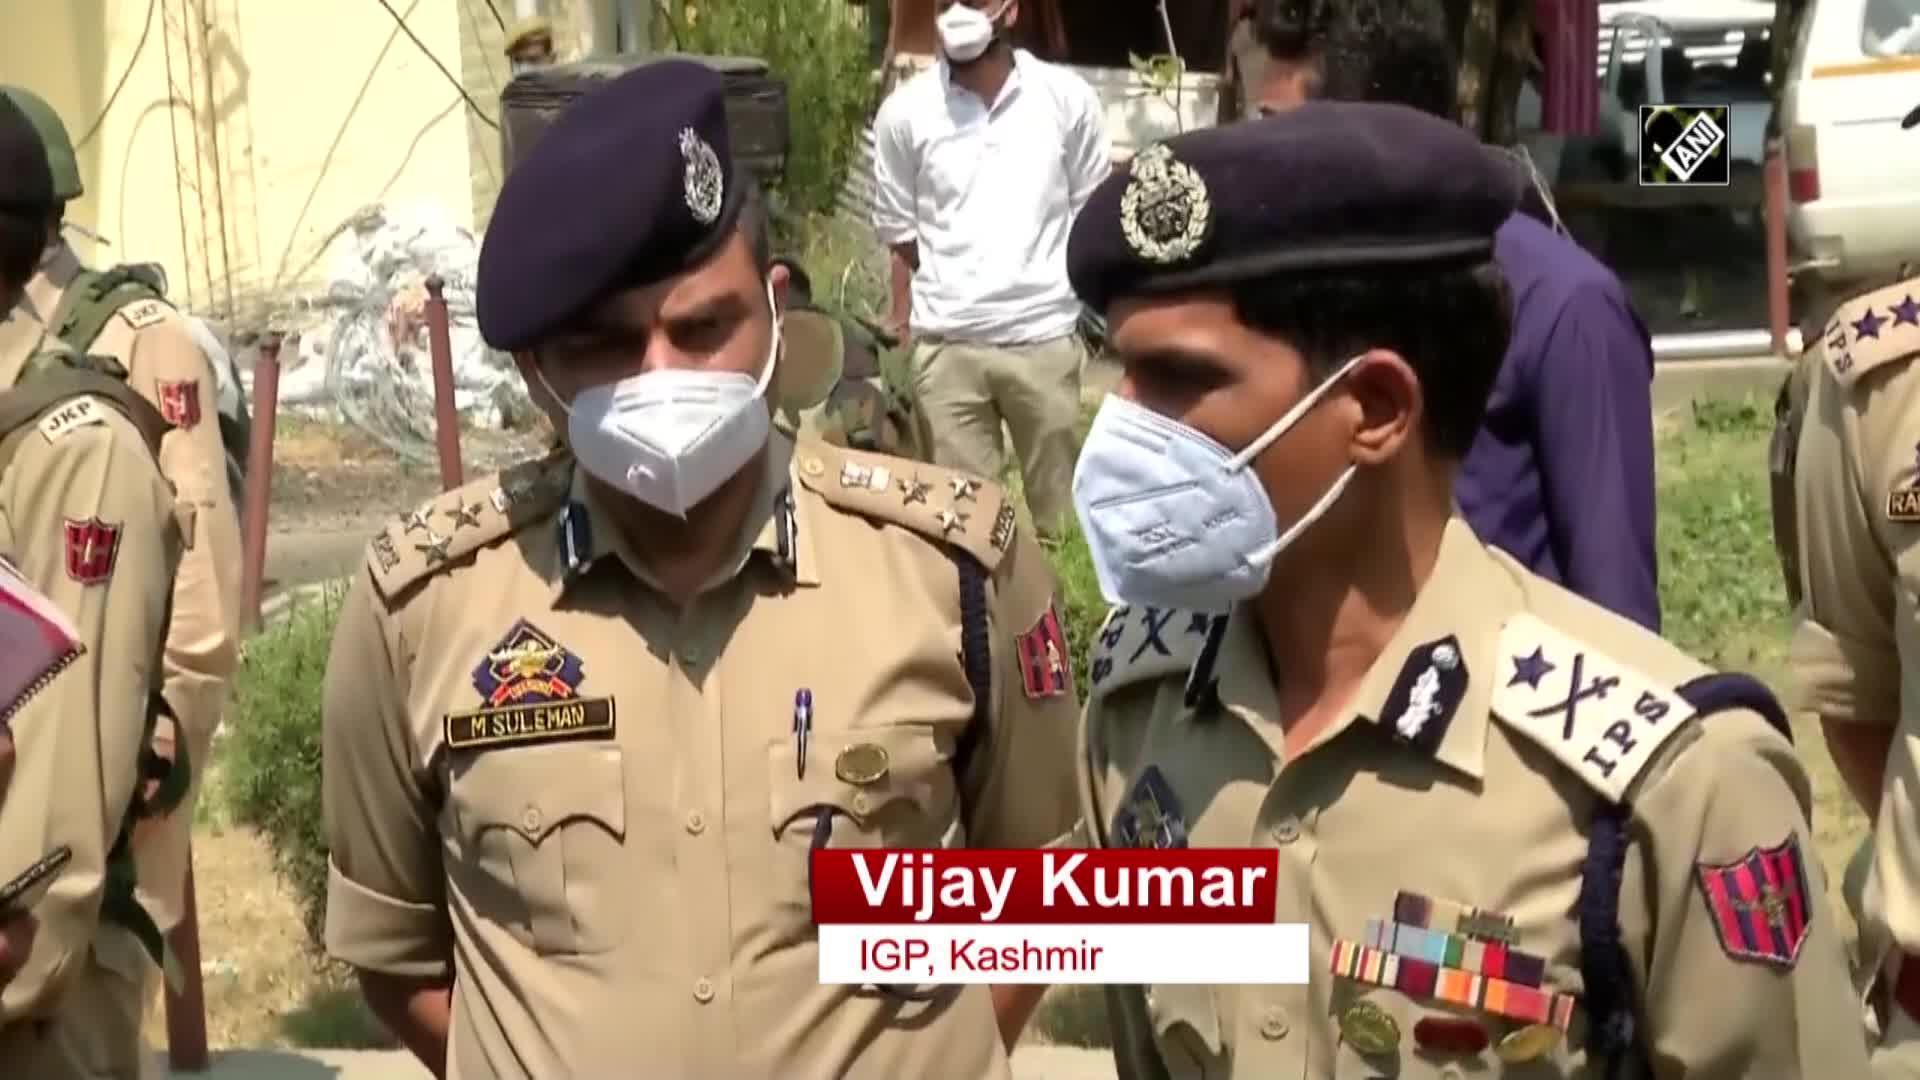 Killing of BJP leader by terrorists seems like pre-planned attack: Kashmir IGP